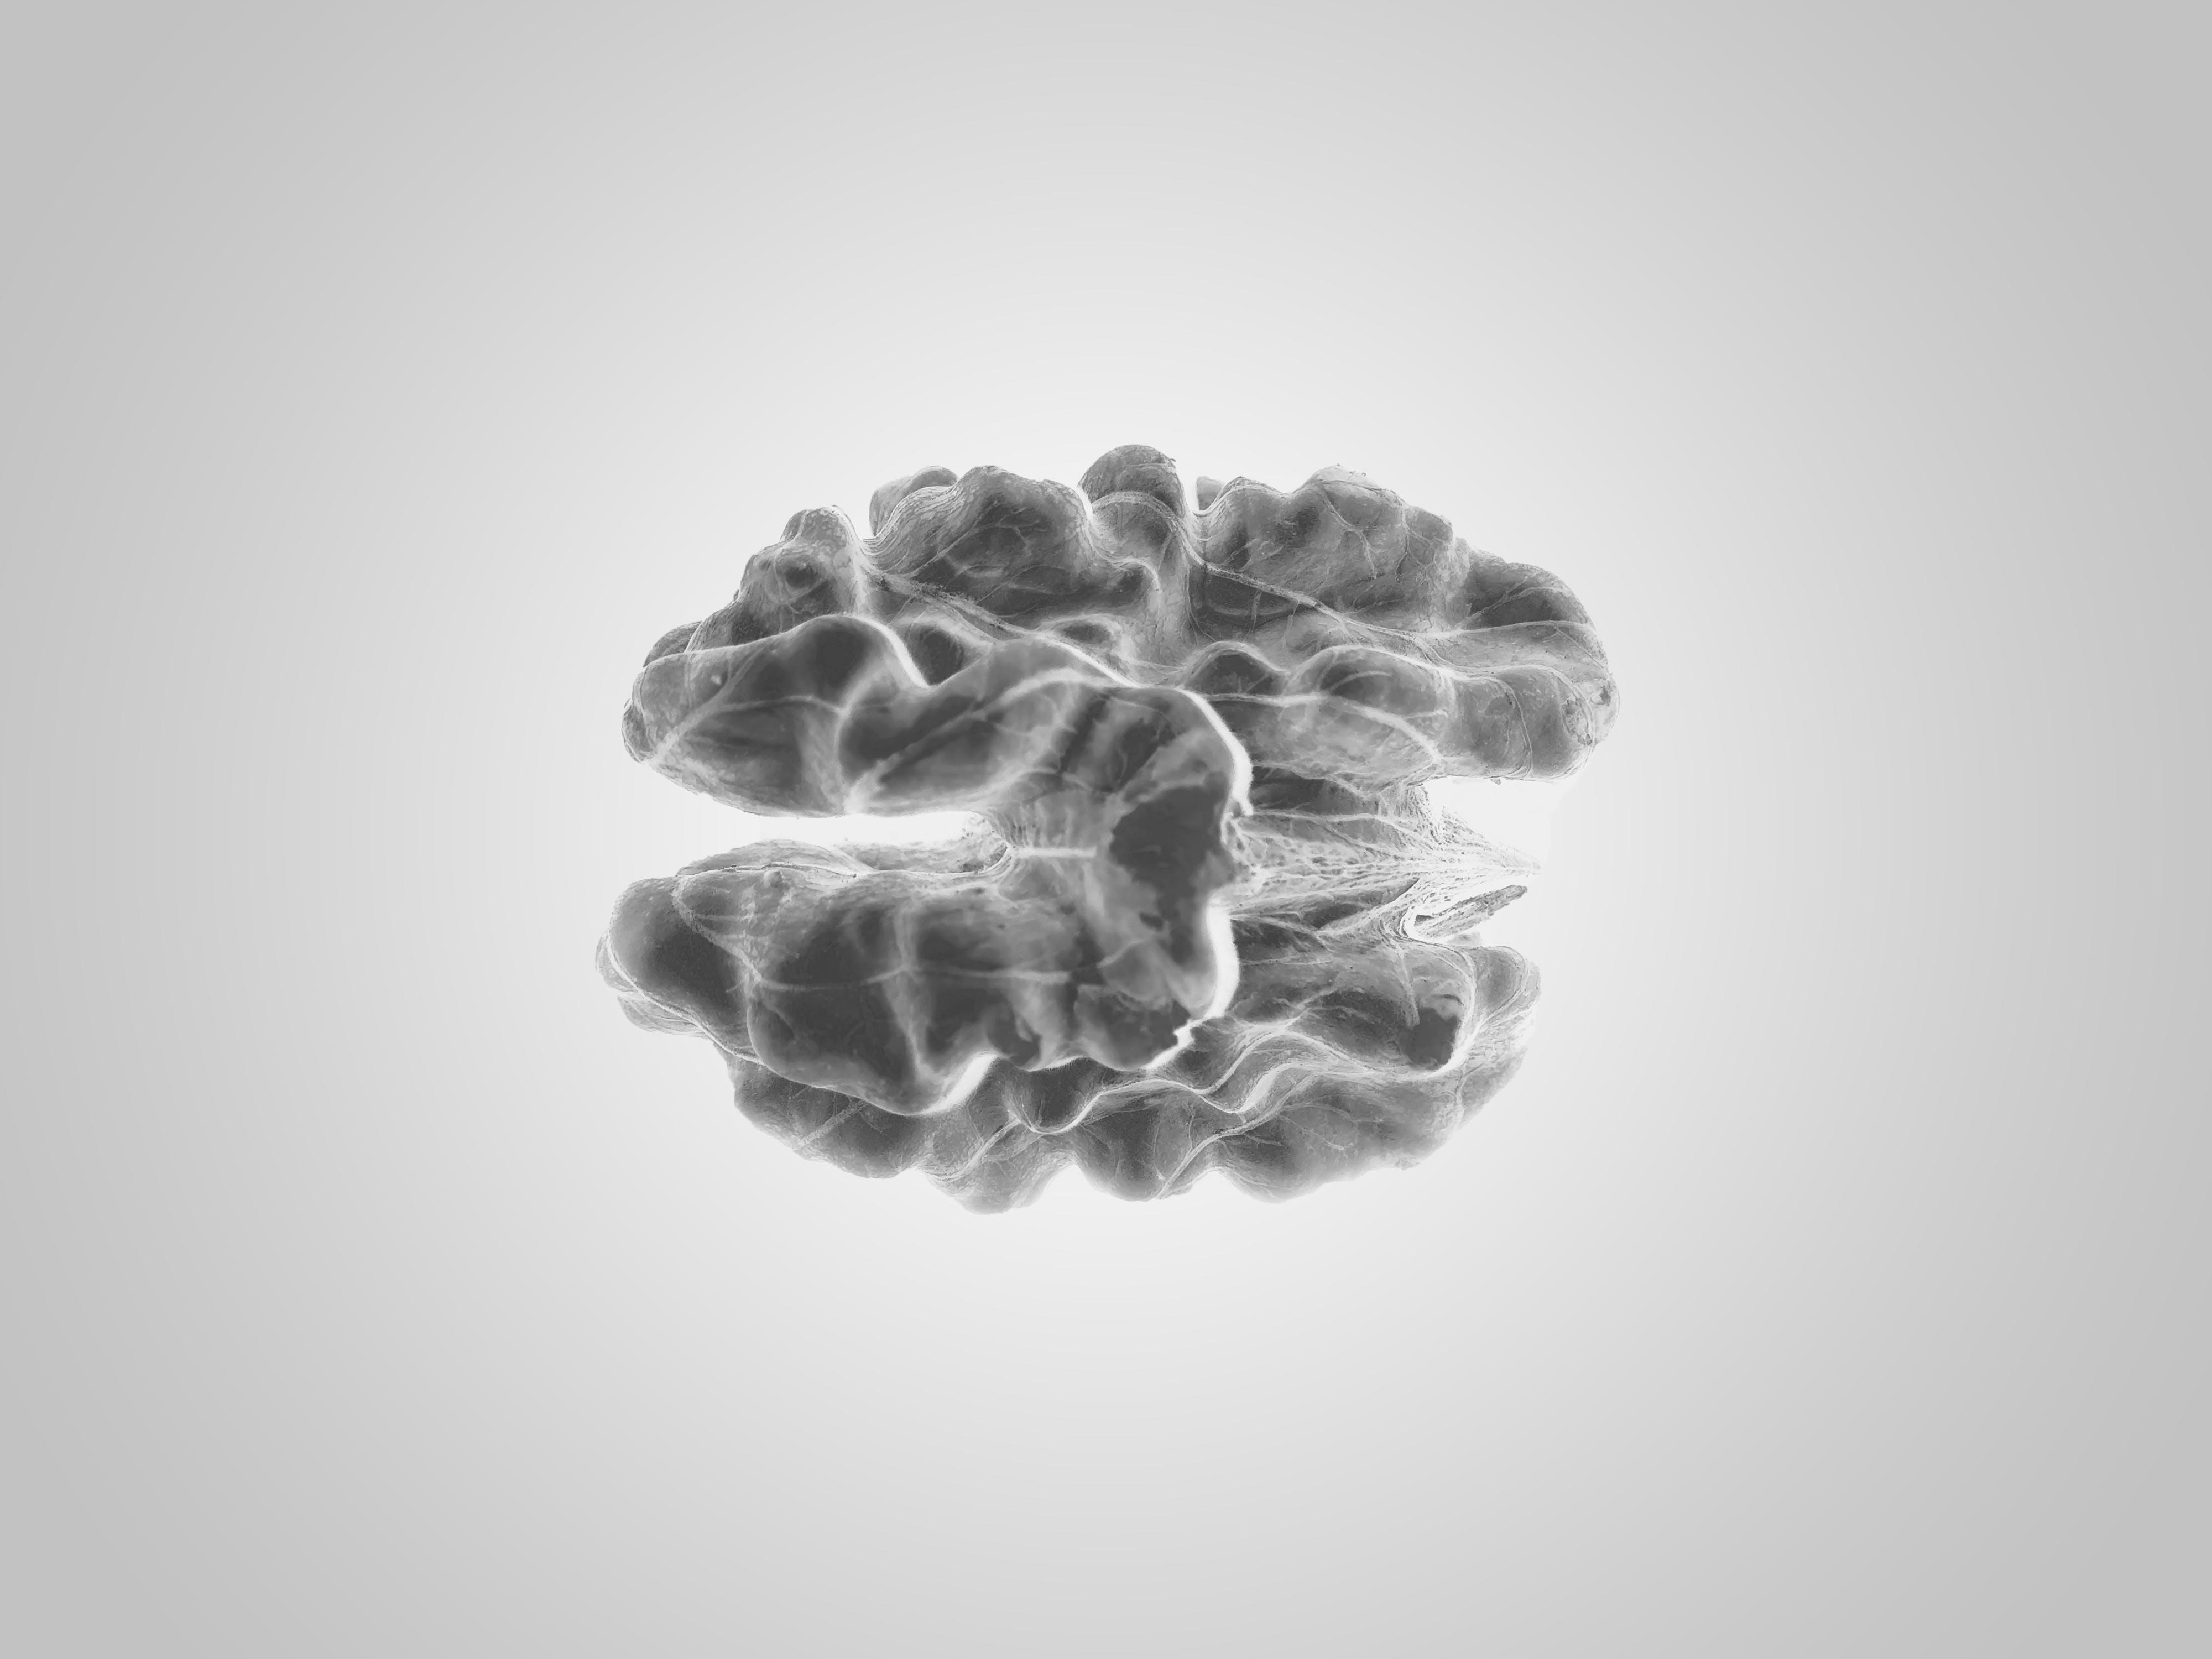 black and white, brain, close-up